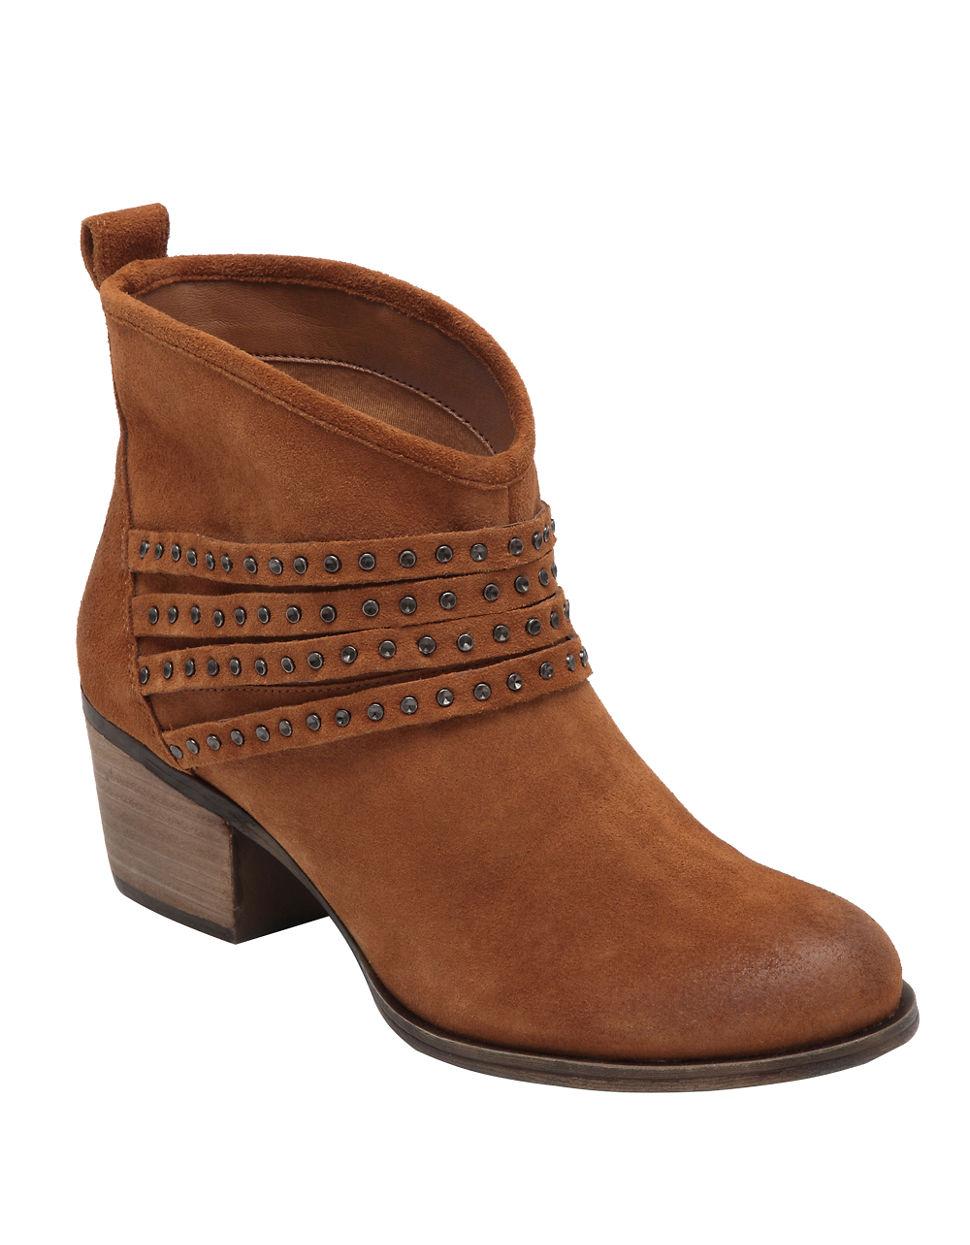 Jessica Simpson Black Mesh Shoes